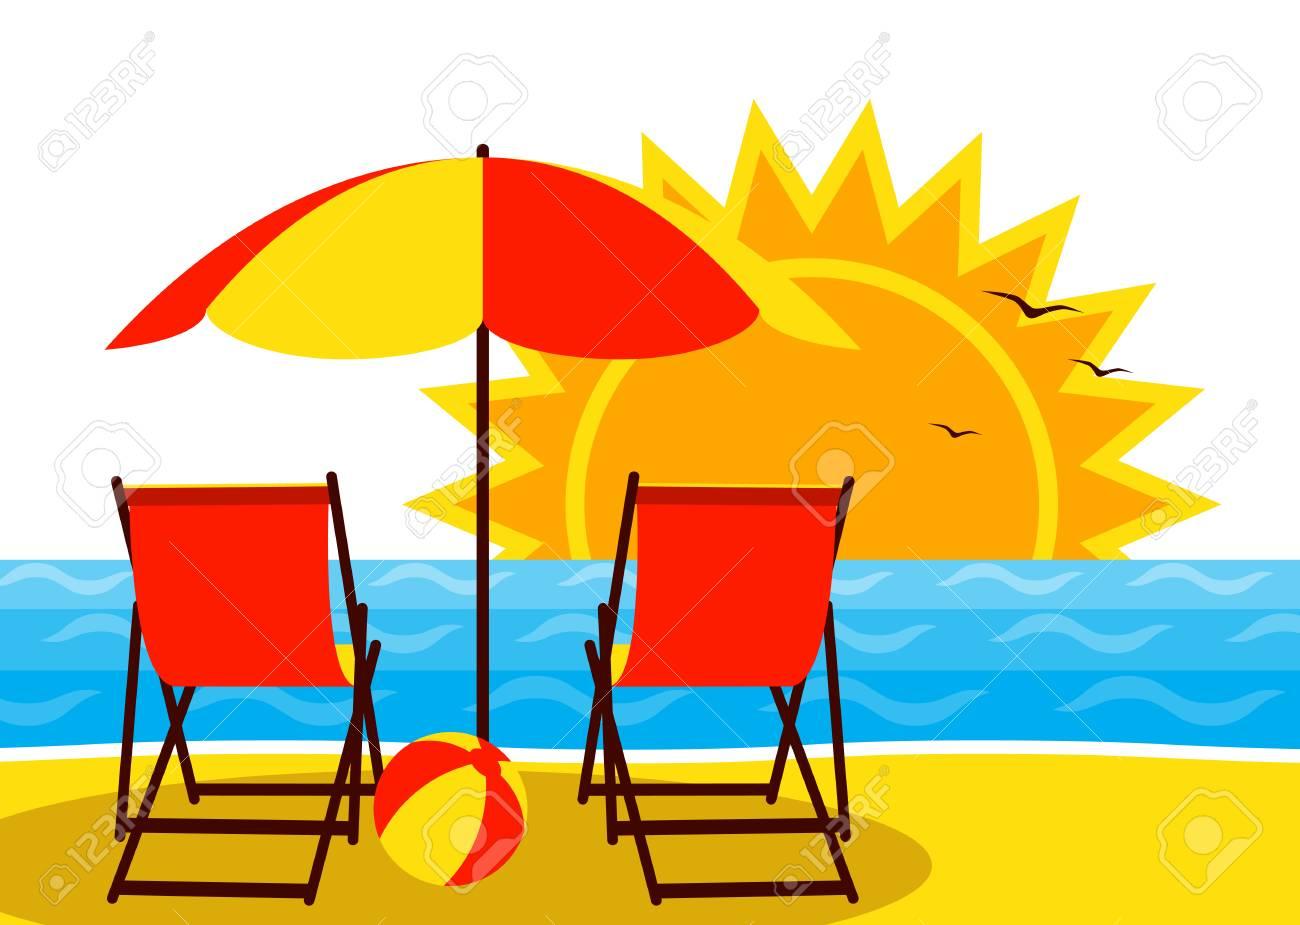 Sonnenschirm strand clipart  Vektor-Liegestühle Unter Sonnenschirm Am Strand Und Sonnenuntergang ...